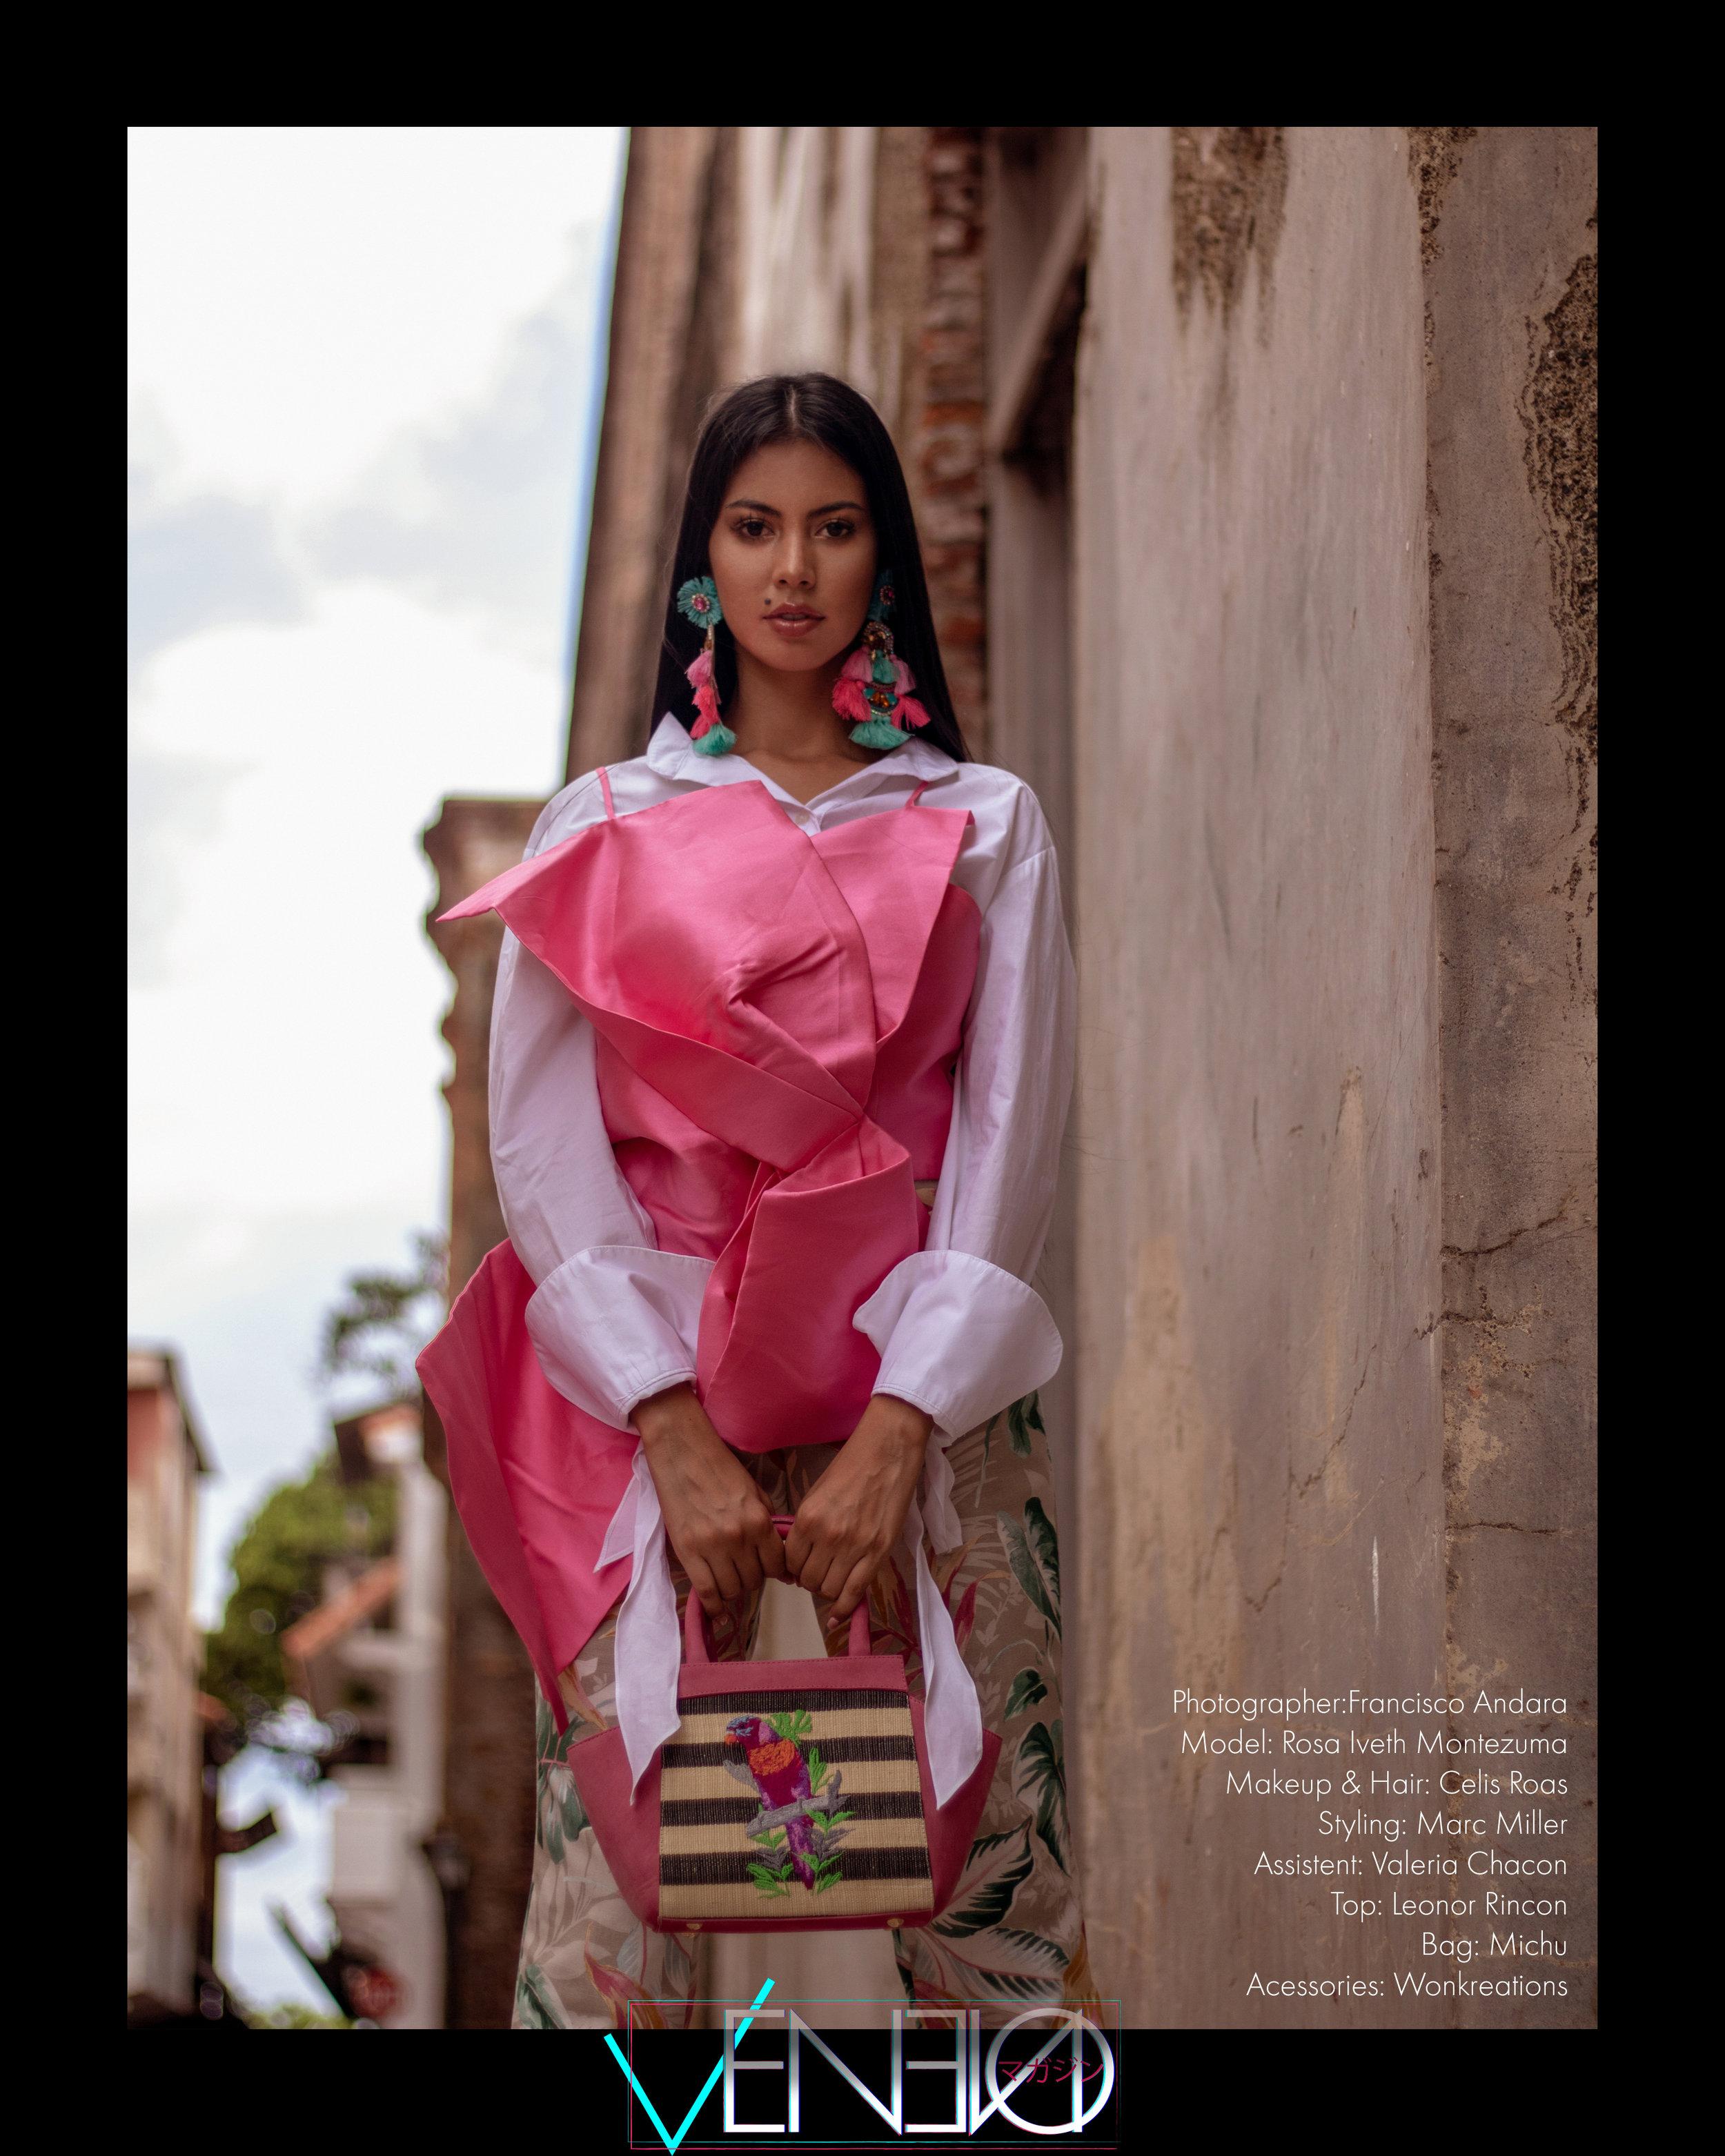 Top: Leonor Rincon  @leonorrincon  Bag: michu  @michubags  Accessories: Wonkreations  @wonkreations  Shoes: Vizzano  @vizzano_oficial